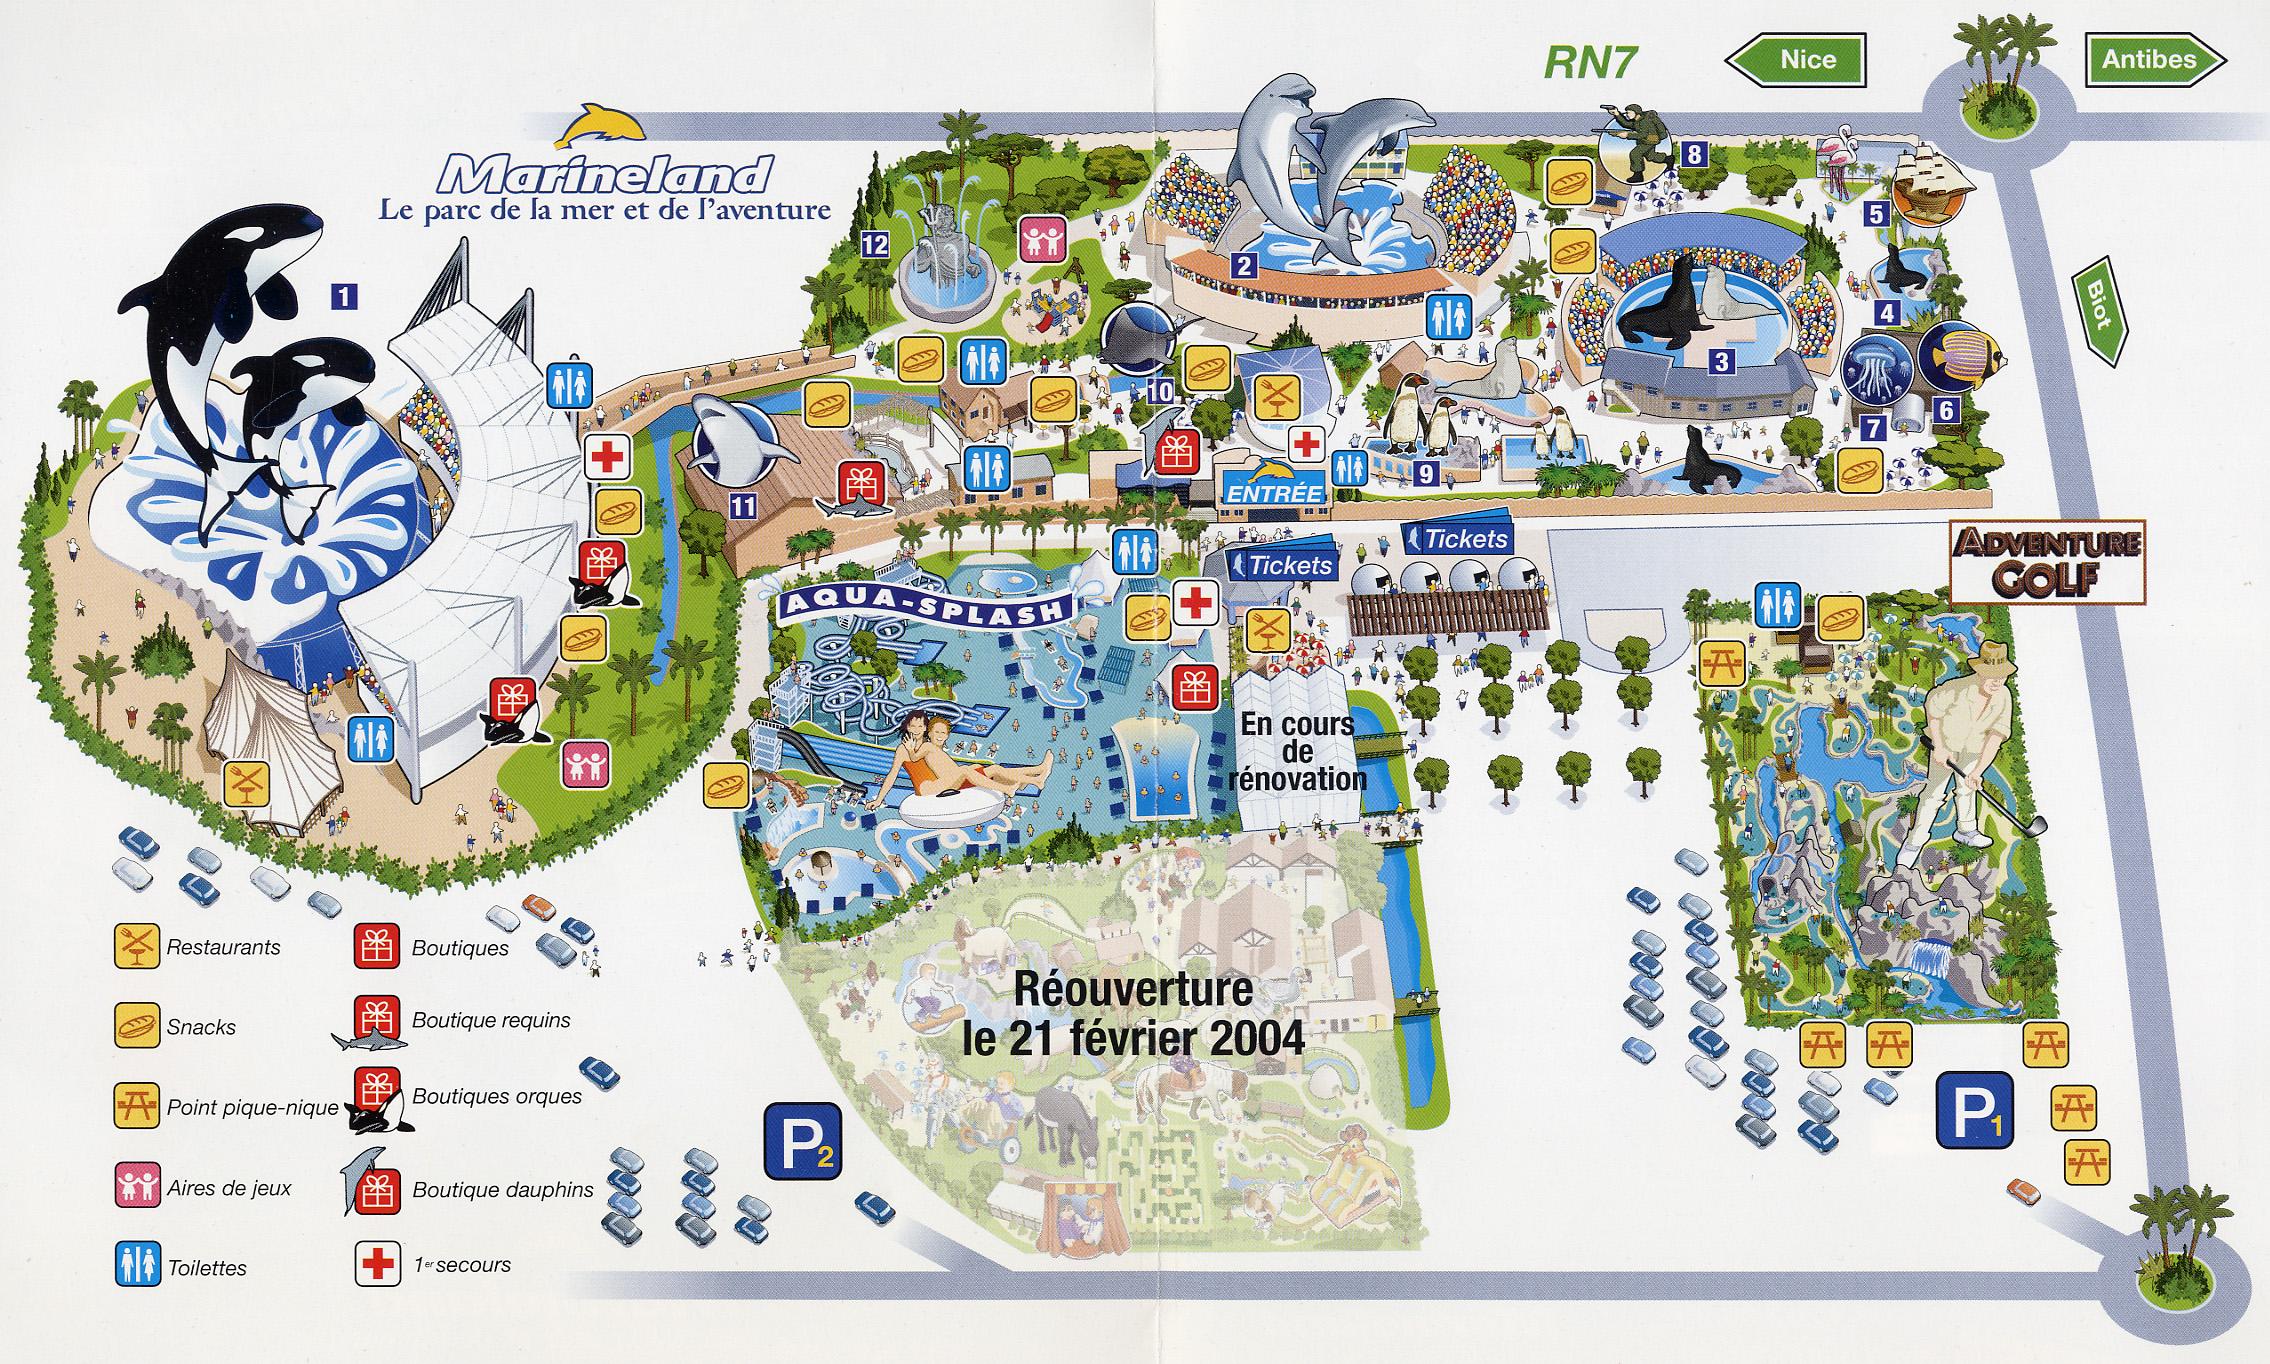 [Images] Ancien plan de Marineland Antibes_plan_2003